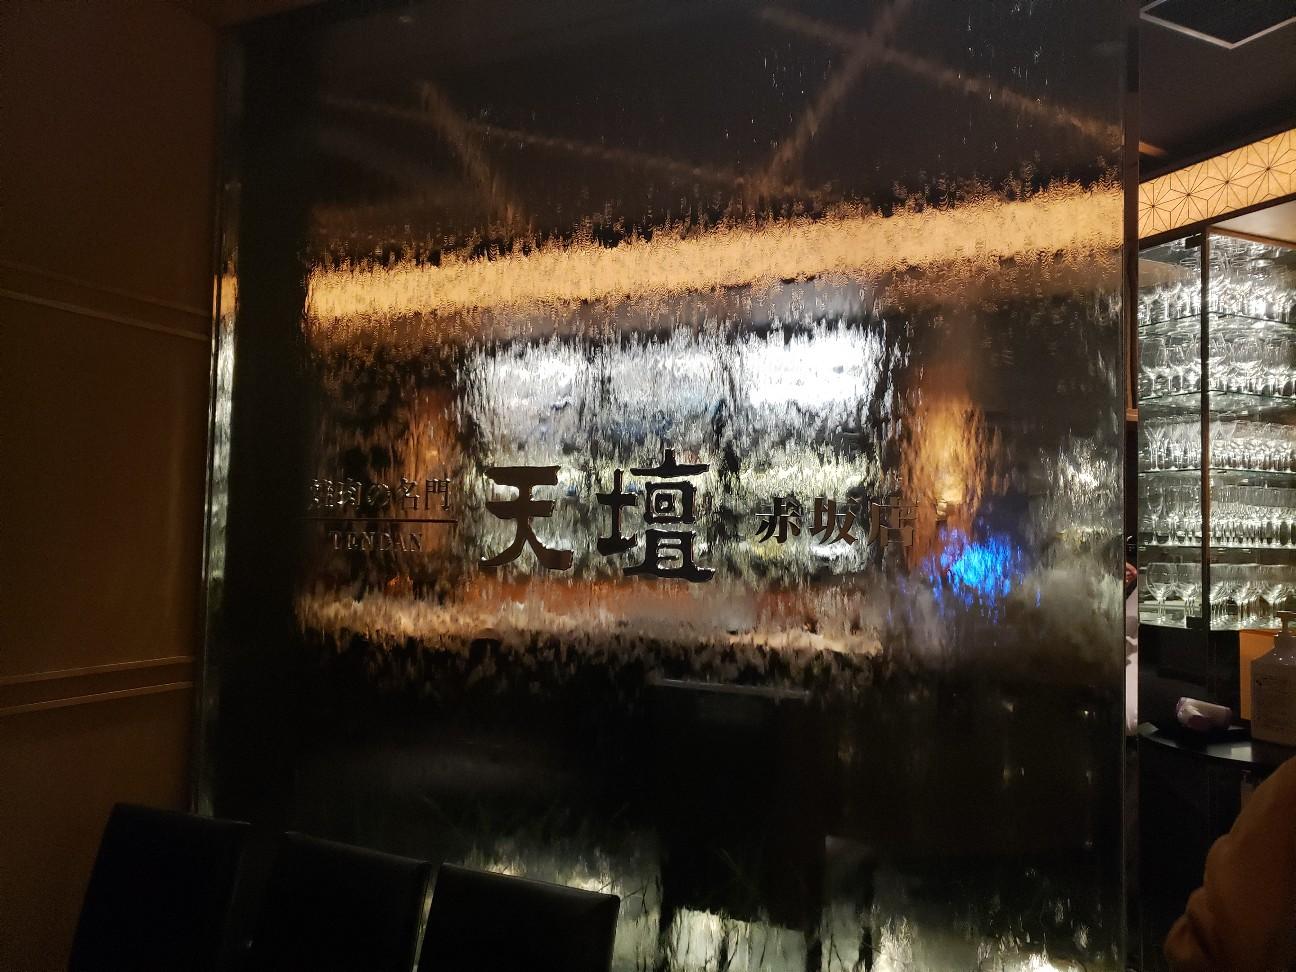 f:id:tt-suzukiit:20201106214800j:image